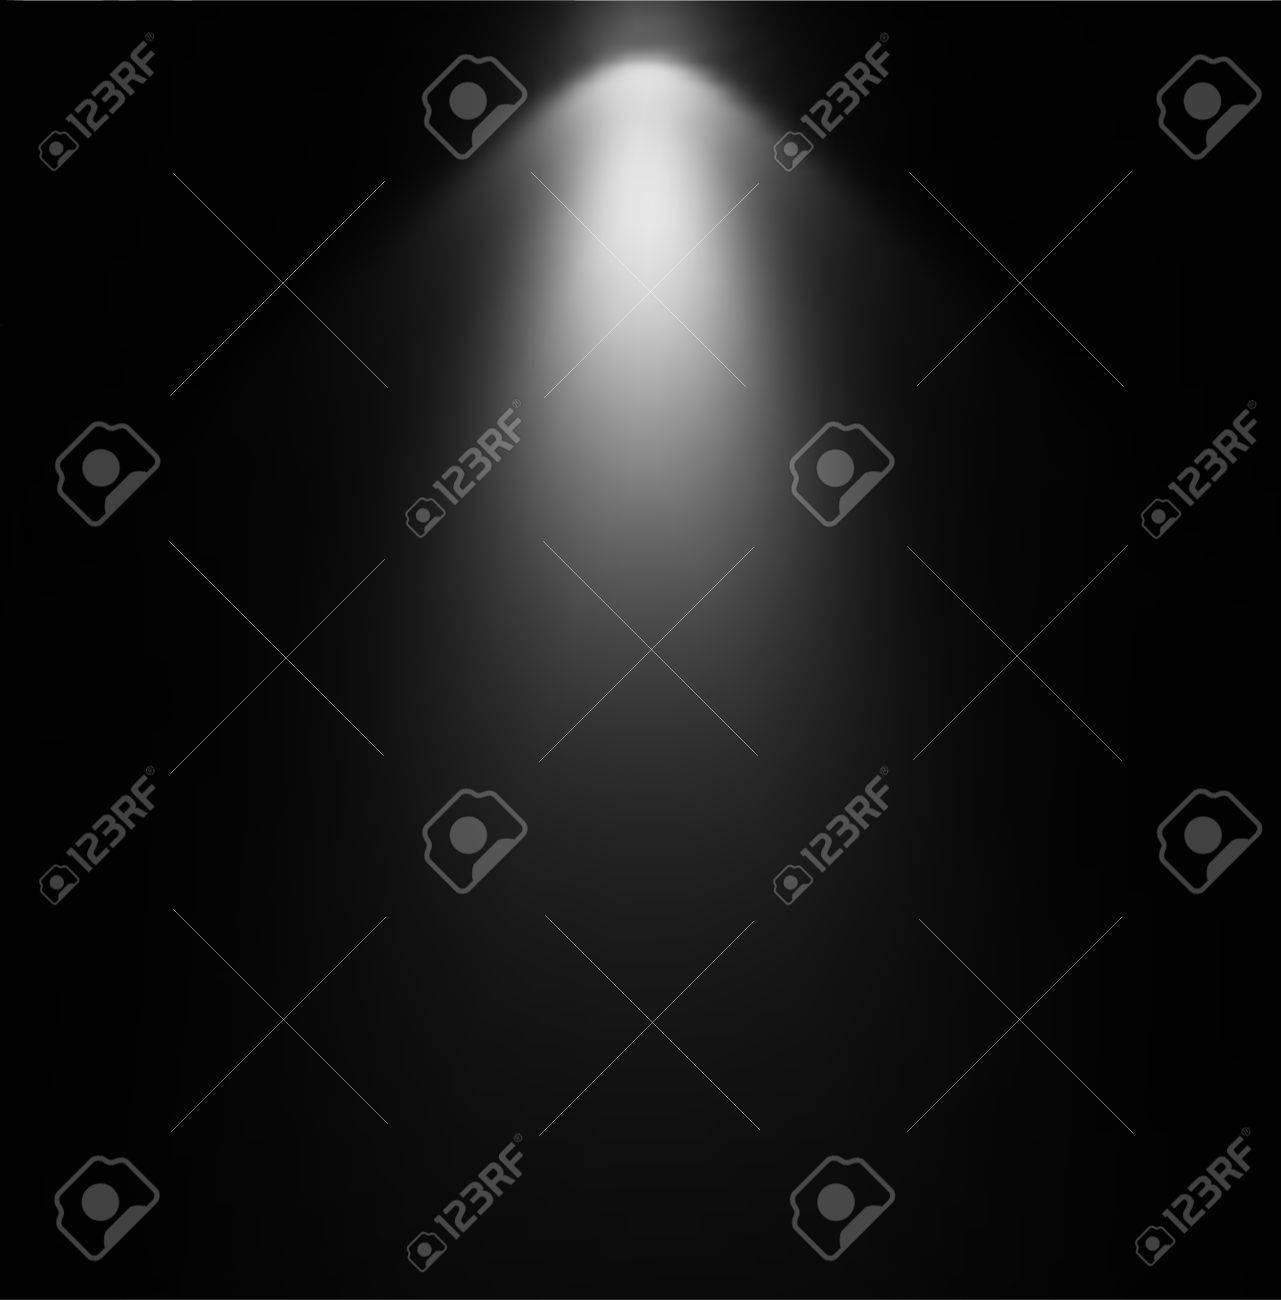 Light Beam From Projector  Vector illustration Stock Vector - 20161943